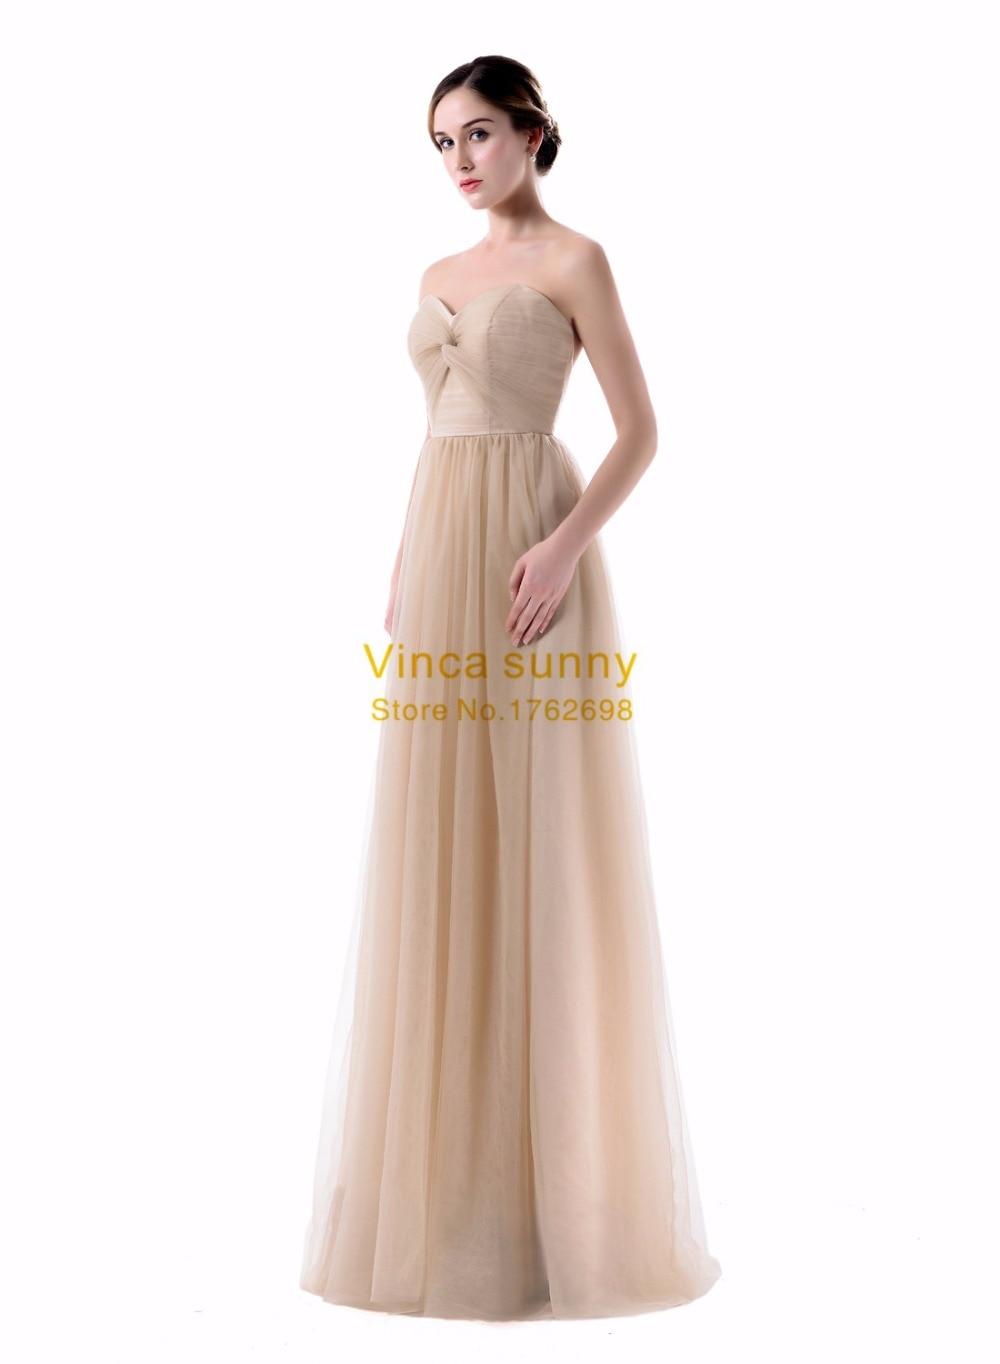 Vinca sunny Elegant Women Chiffon V Neck Bridesmaid Dresses cheap vestido  festa casamento longo madrinha dress for bridesmaid -in Bridesmaid Dresses  from ... 52eaedc1df3a